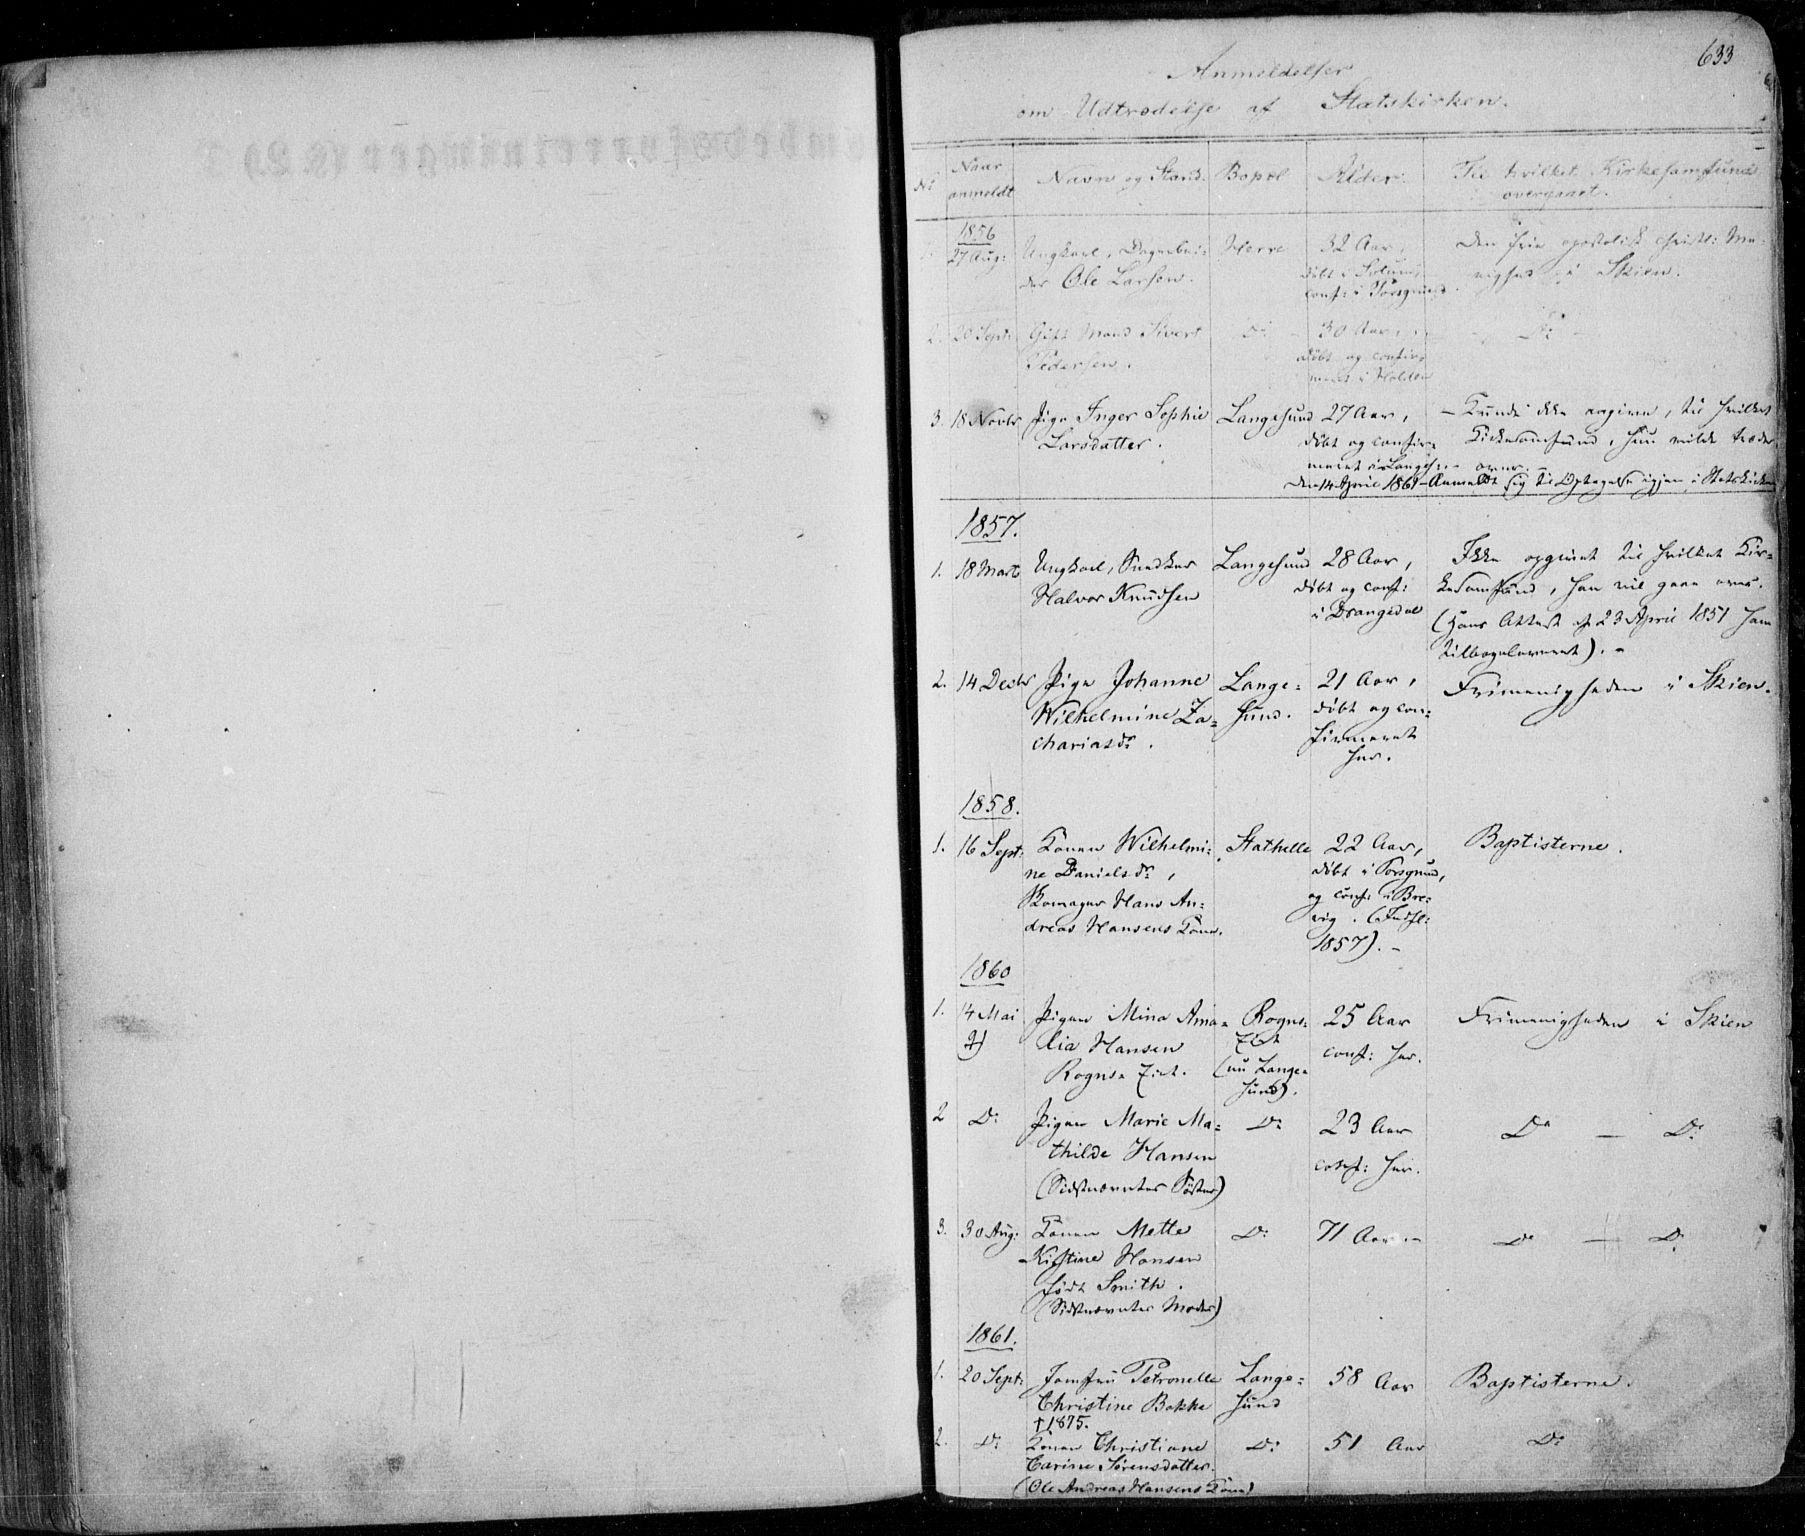 SAKO, Bamble kirkebøker, F/Fa/L0005: Ministerialbok nr. I 5, 1854-1869, s. 633